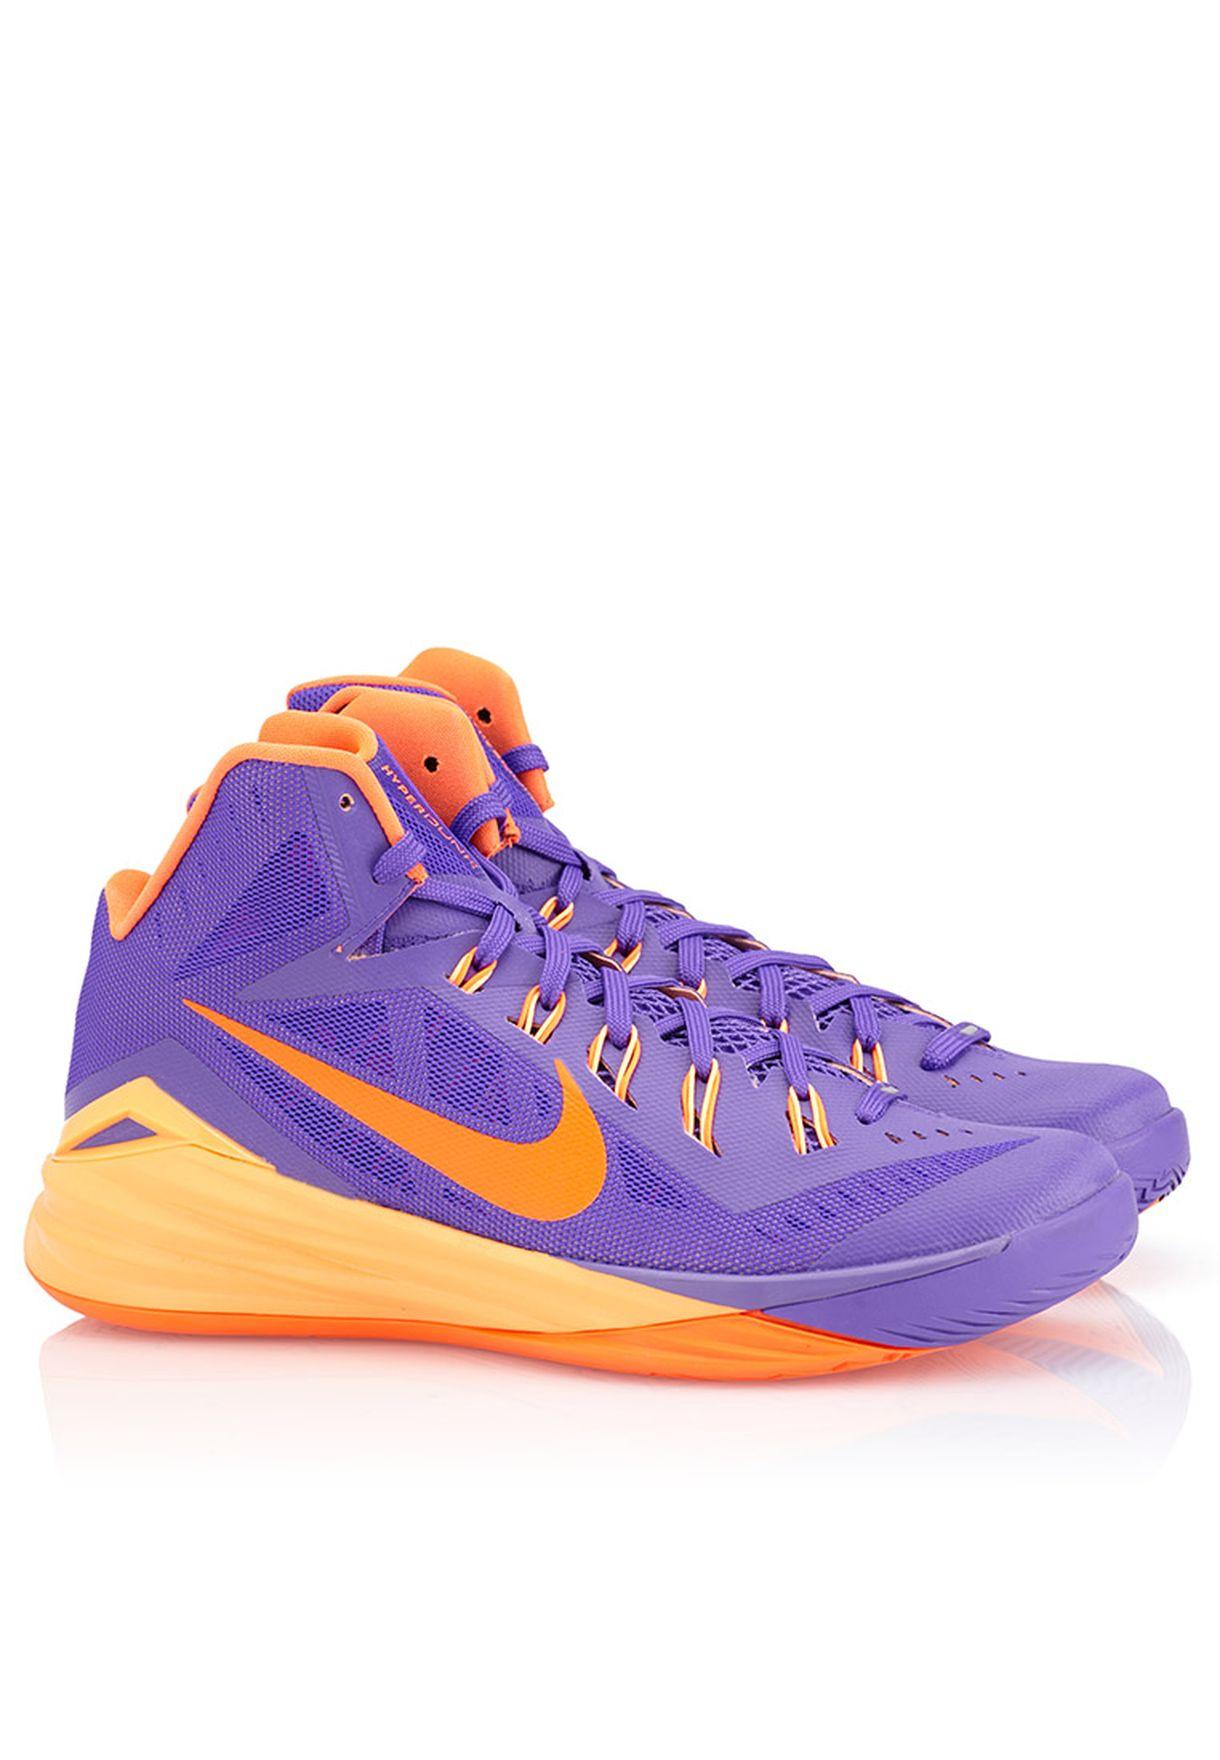 8bc4793b640 Shop Nike multicolor Hyperdunk 2014 653640-588 for Men in UAE ...